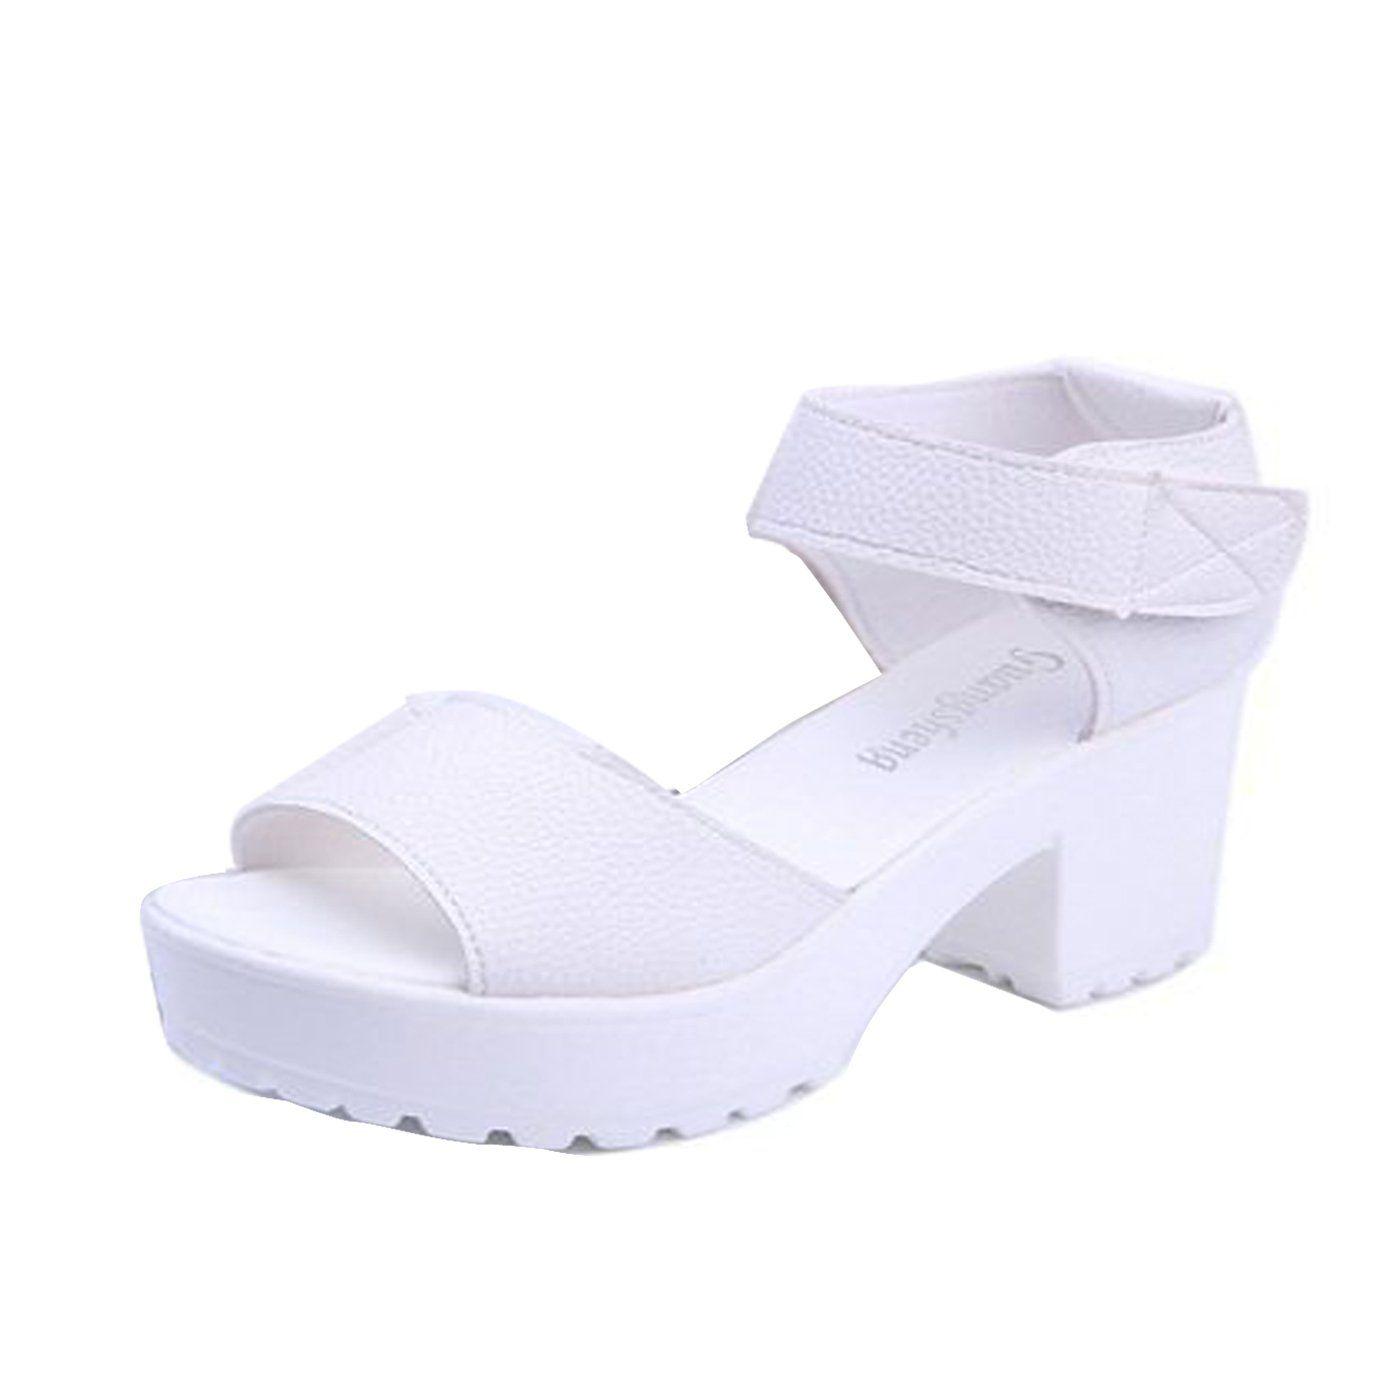 Amazon.com: Women Summer Sandals Velcro